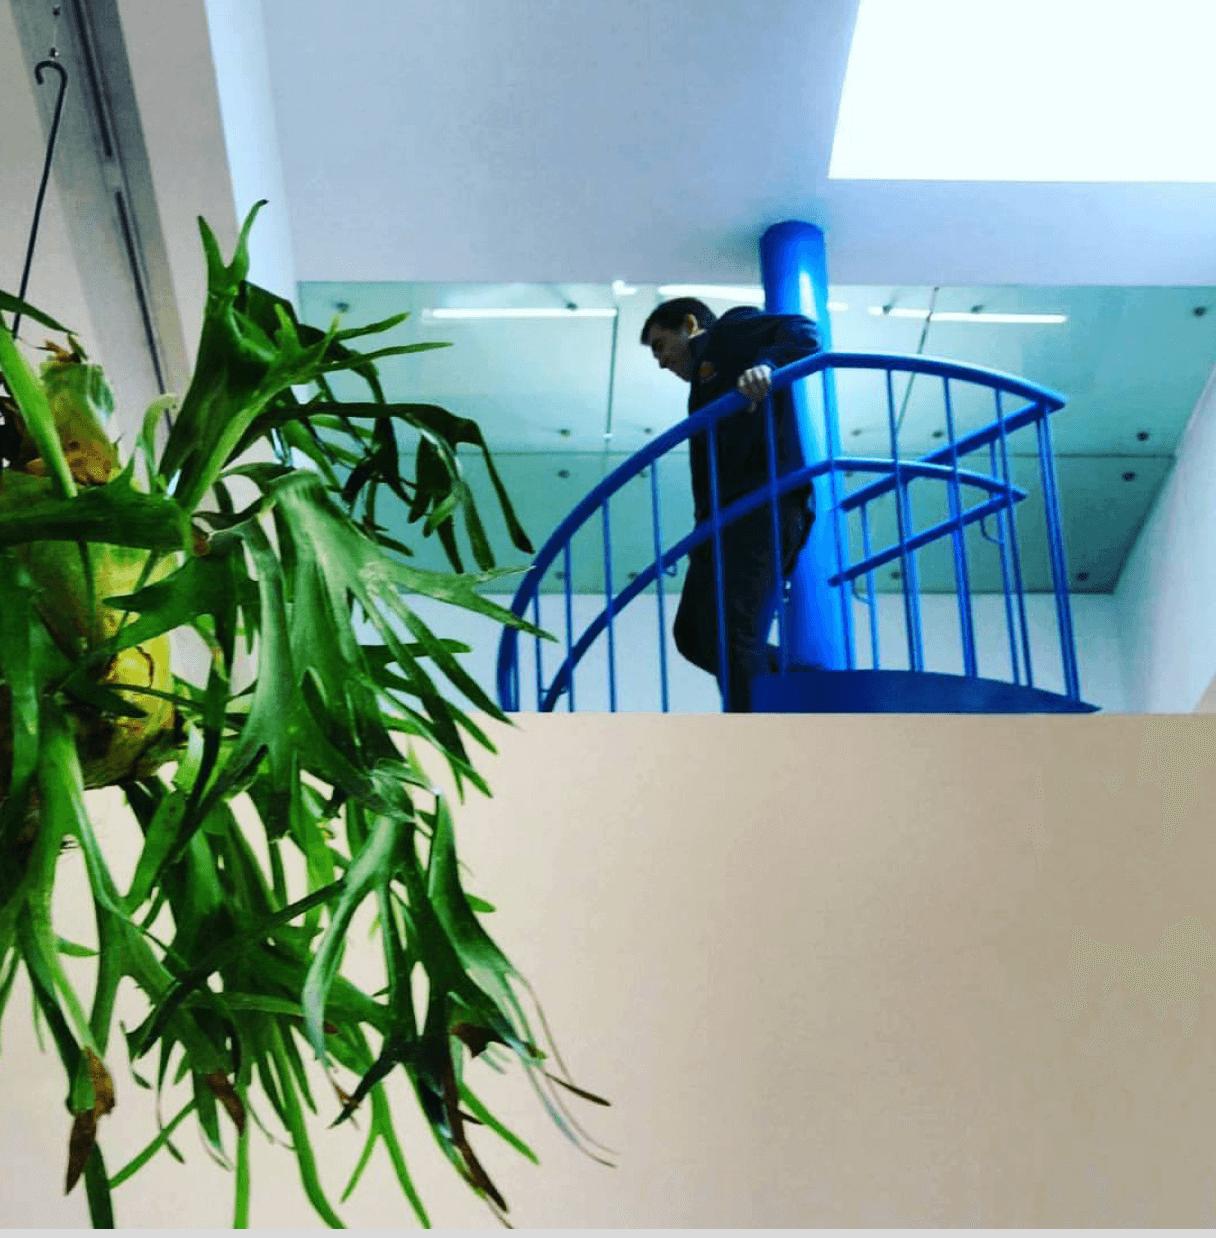 Platycerim bifurcatum  The Water Event (Yoko Ono, Dream Come True) Malba, 2016